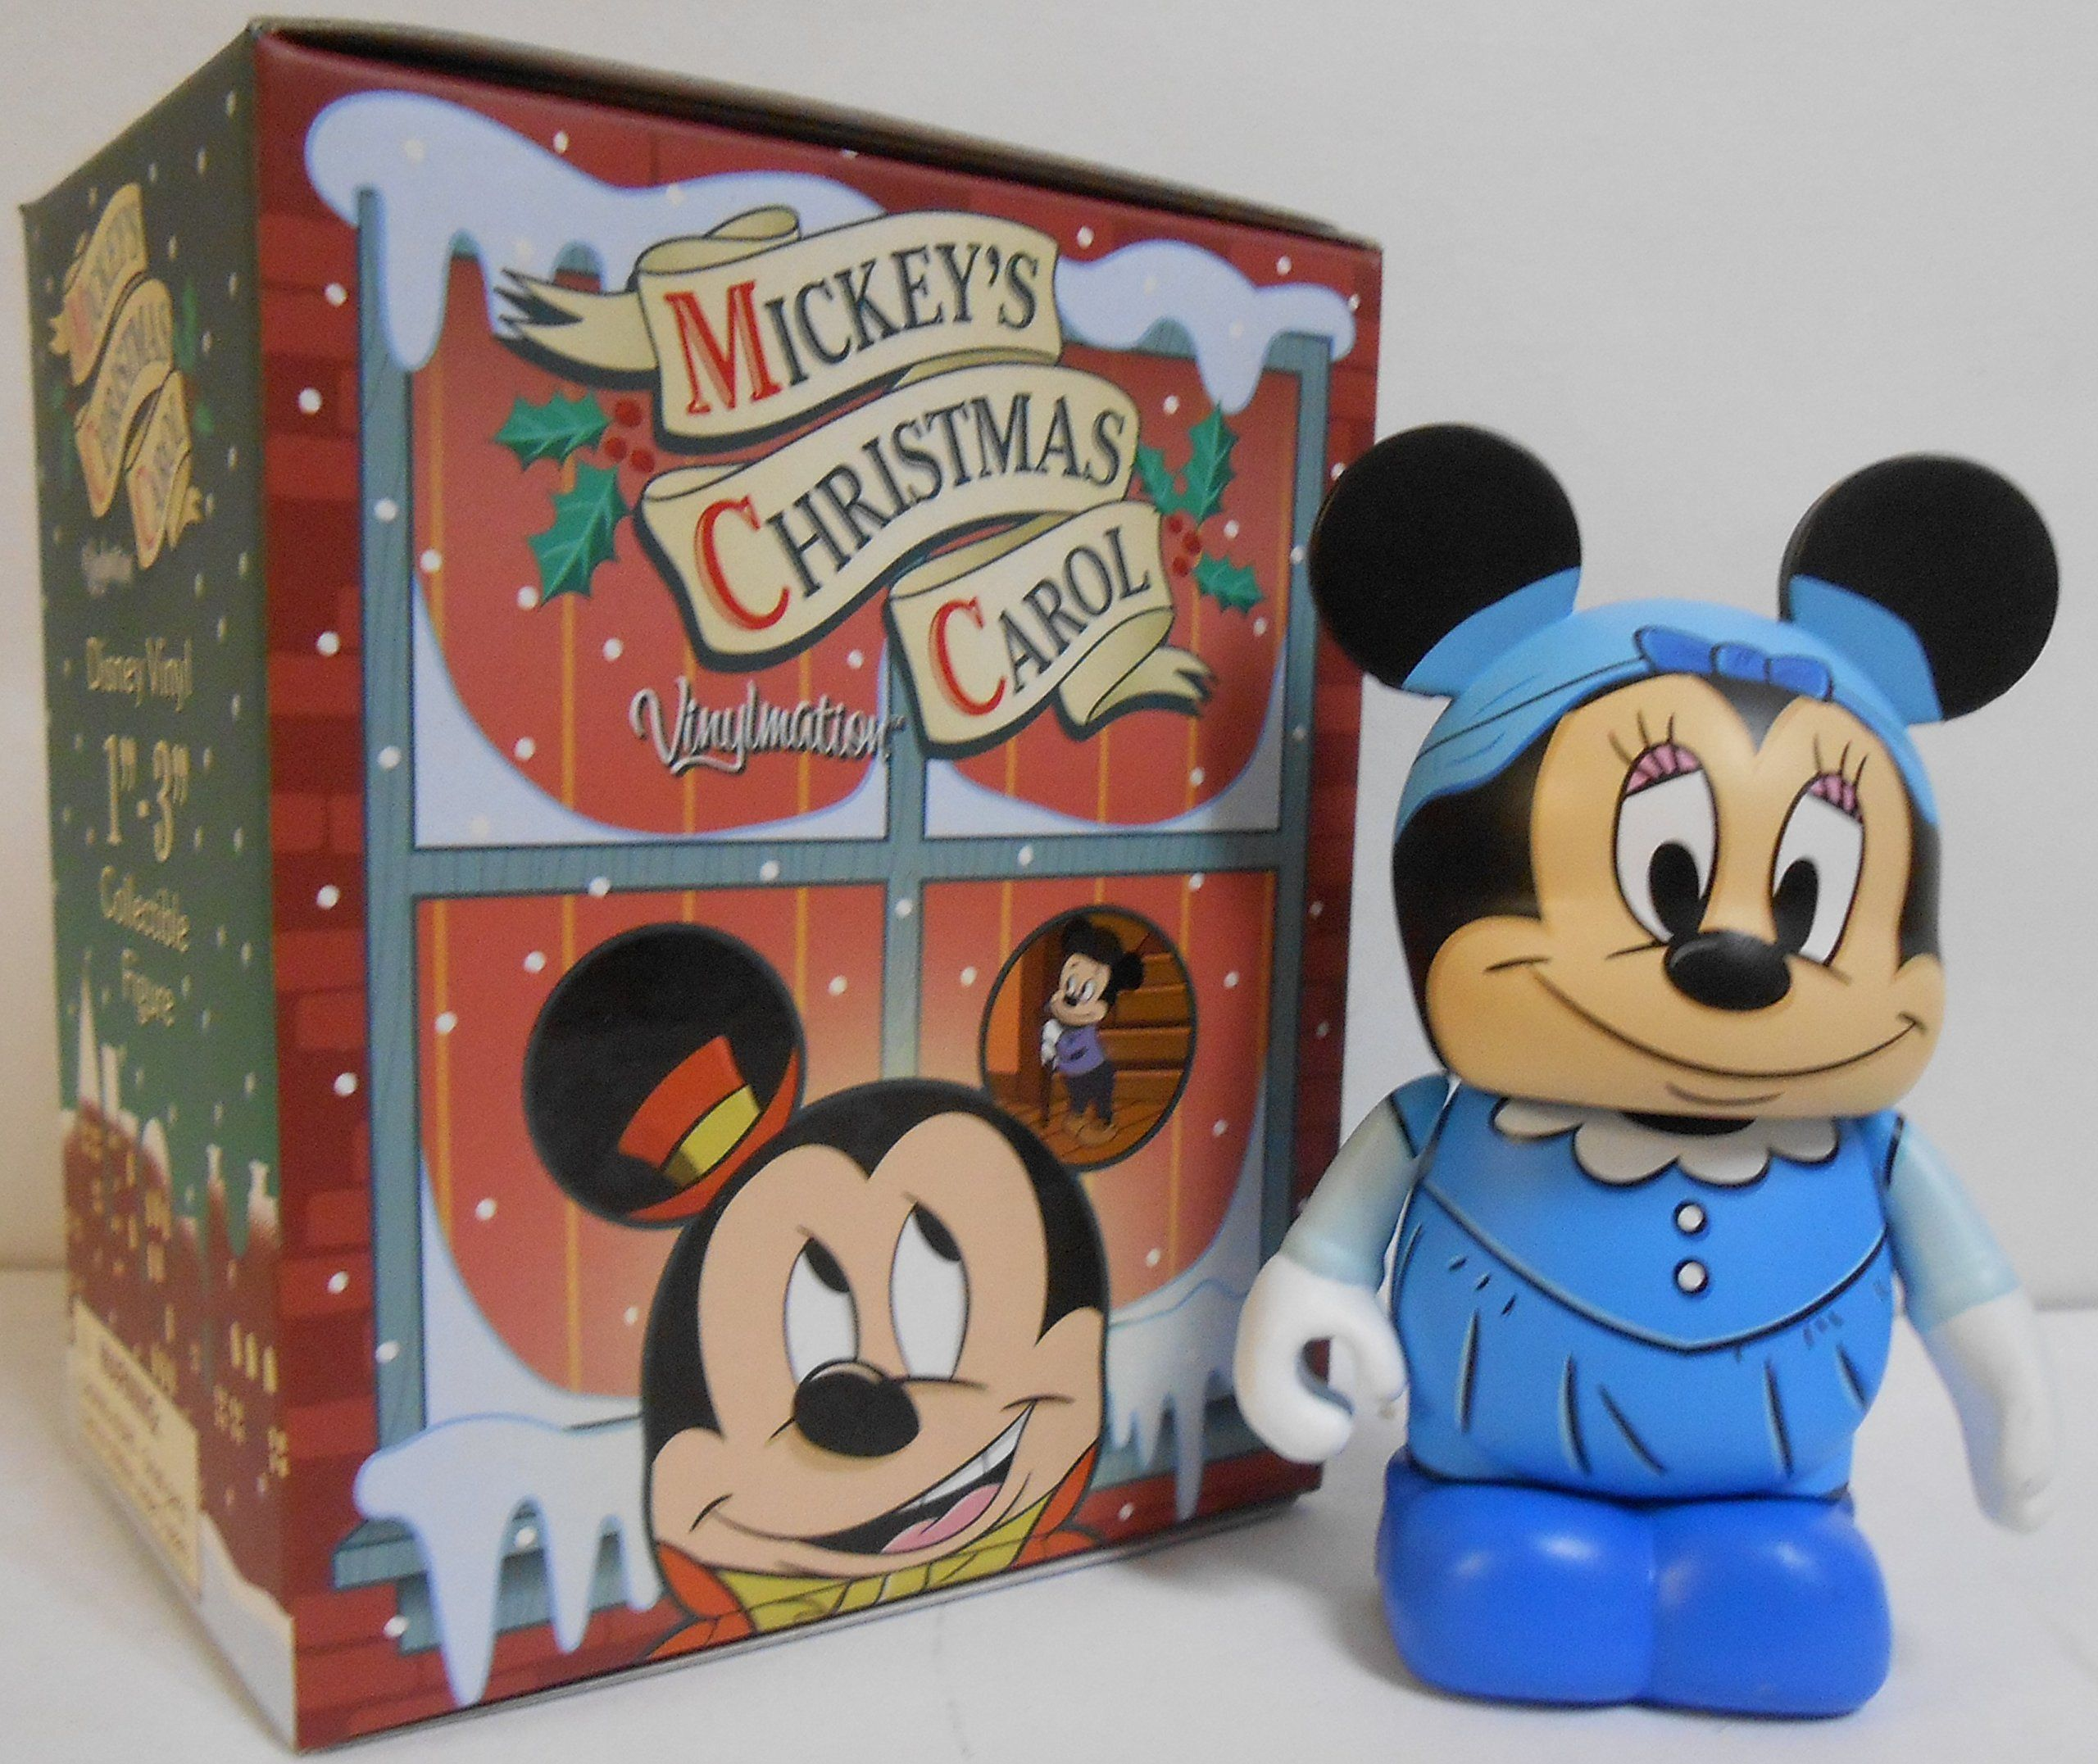 Mickeys Christmas Carol Minnie.Mickey S Christmas Carol Minnie Mouse As Emily Cratchit